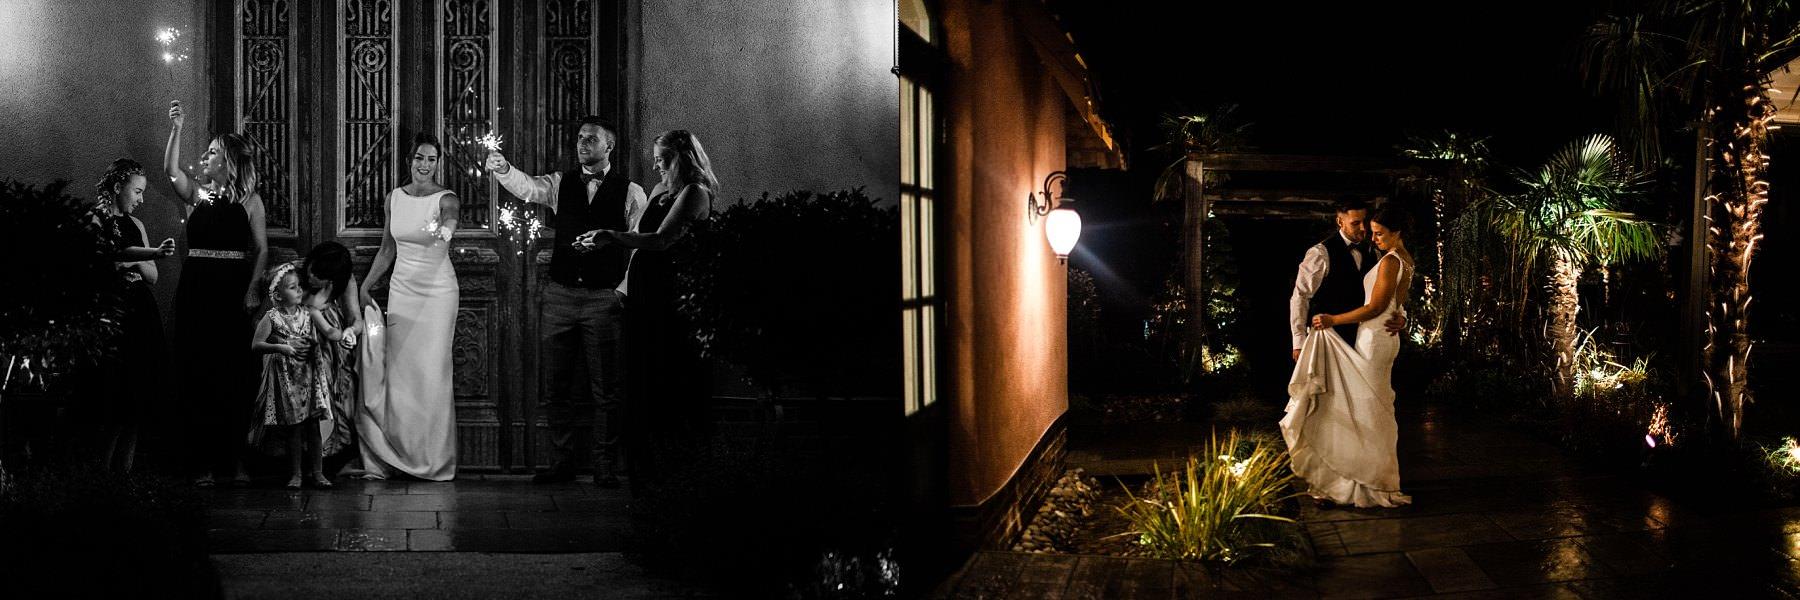 sparklers speeches Le petite Chateau wedding - Newcastle Wedding Photographer